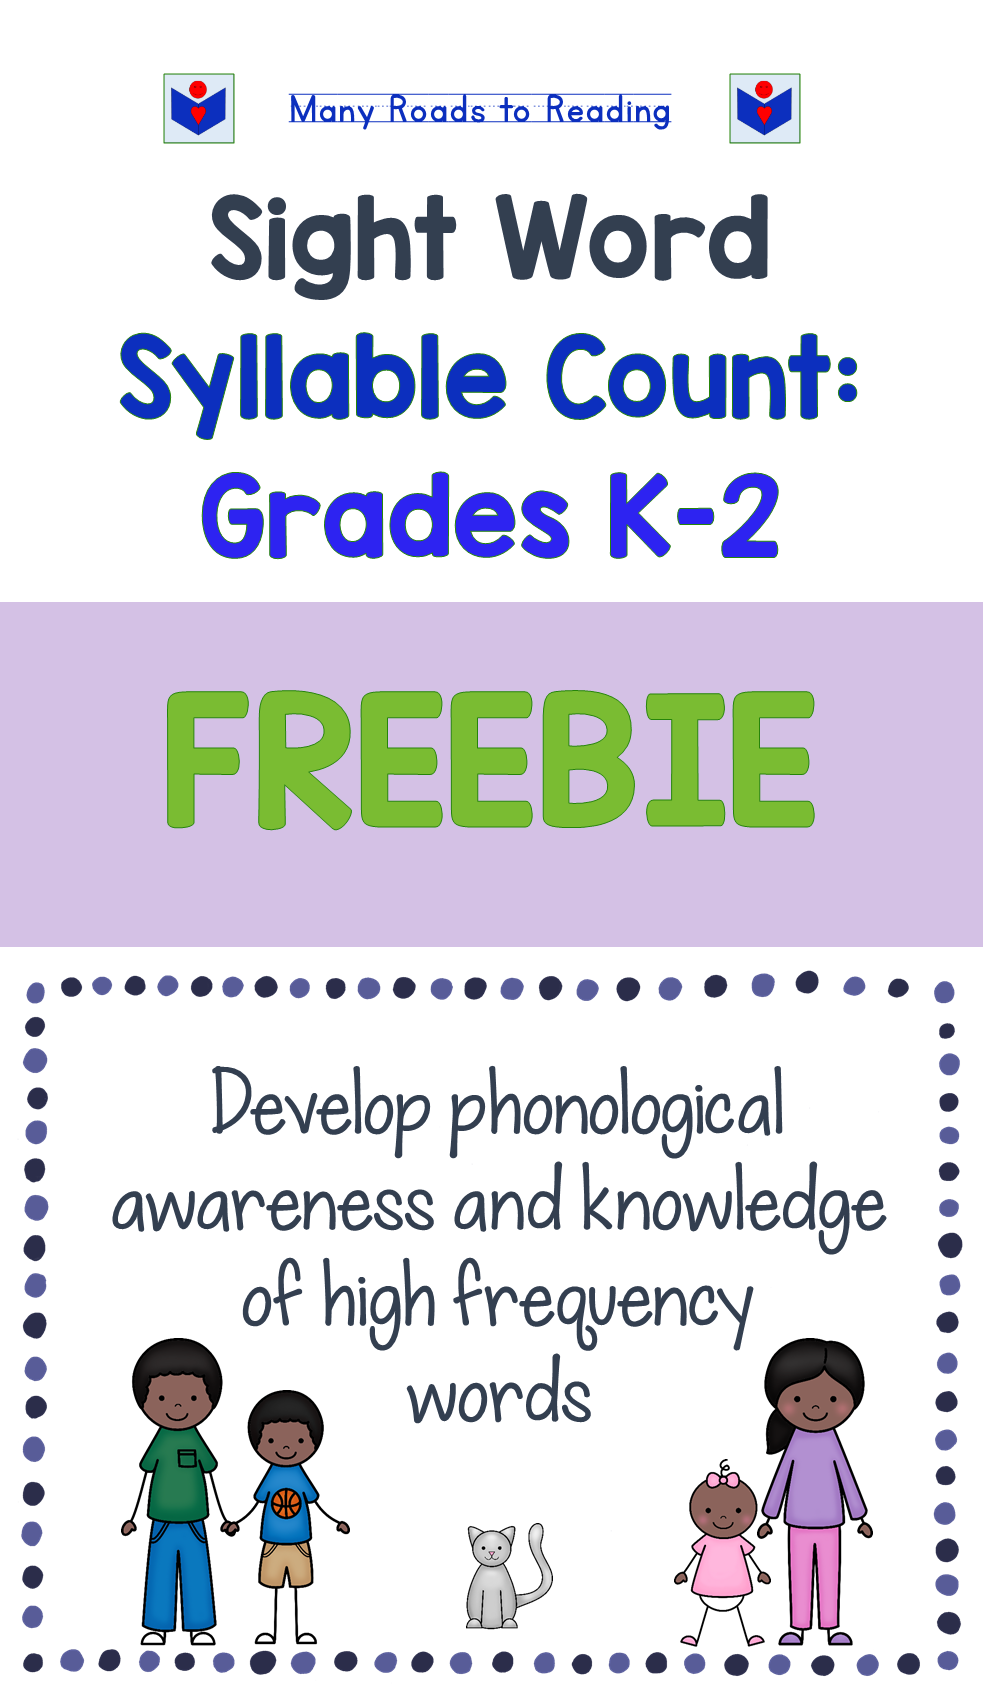 Sight Word Syllable Count: Grades K-2 FREEBIE | Pinterest